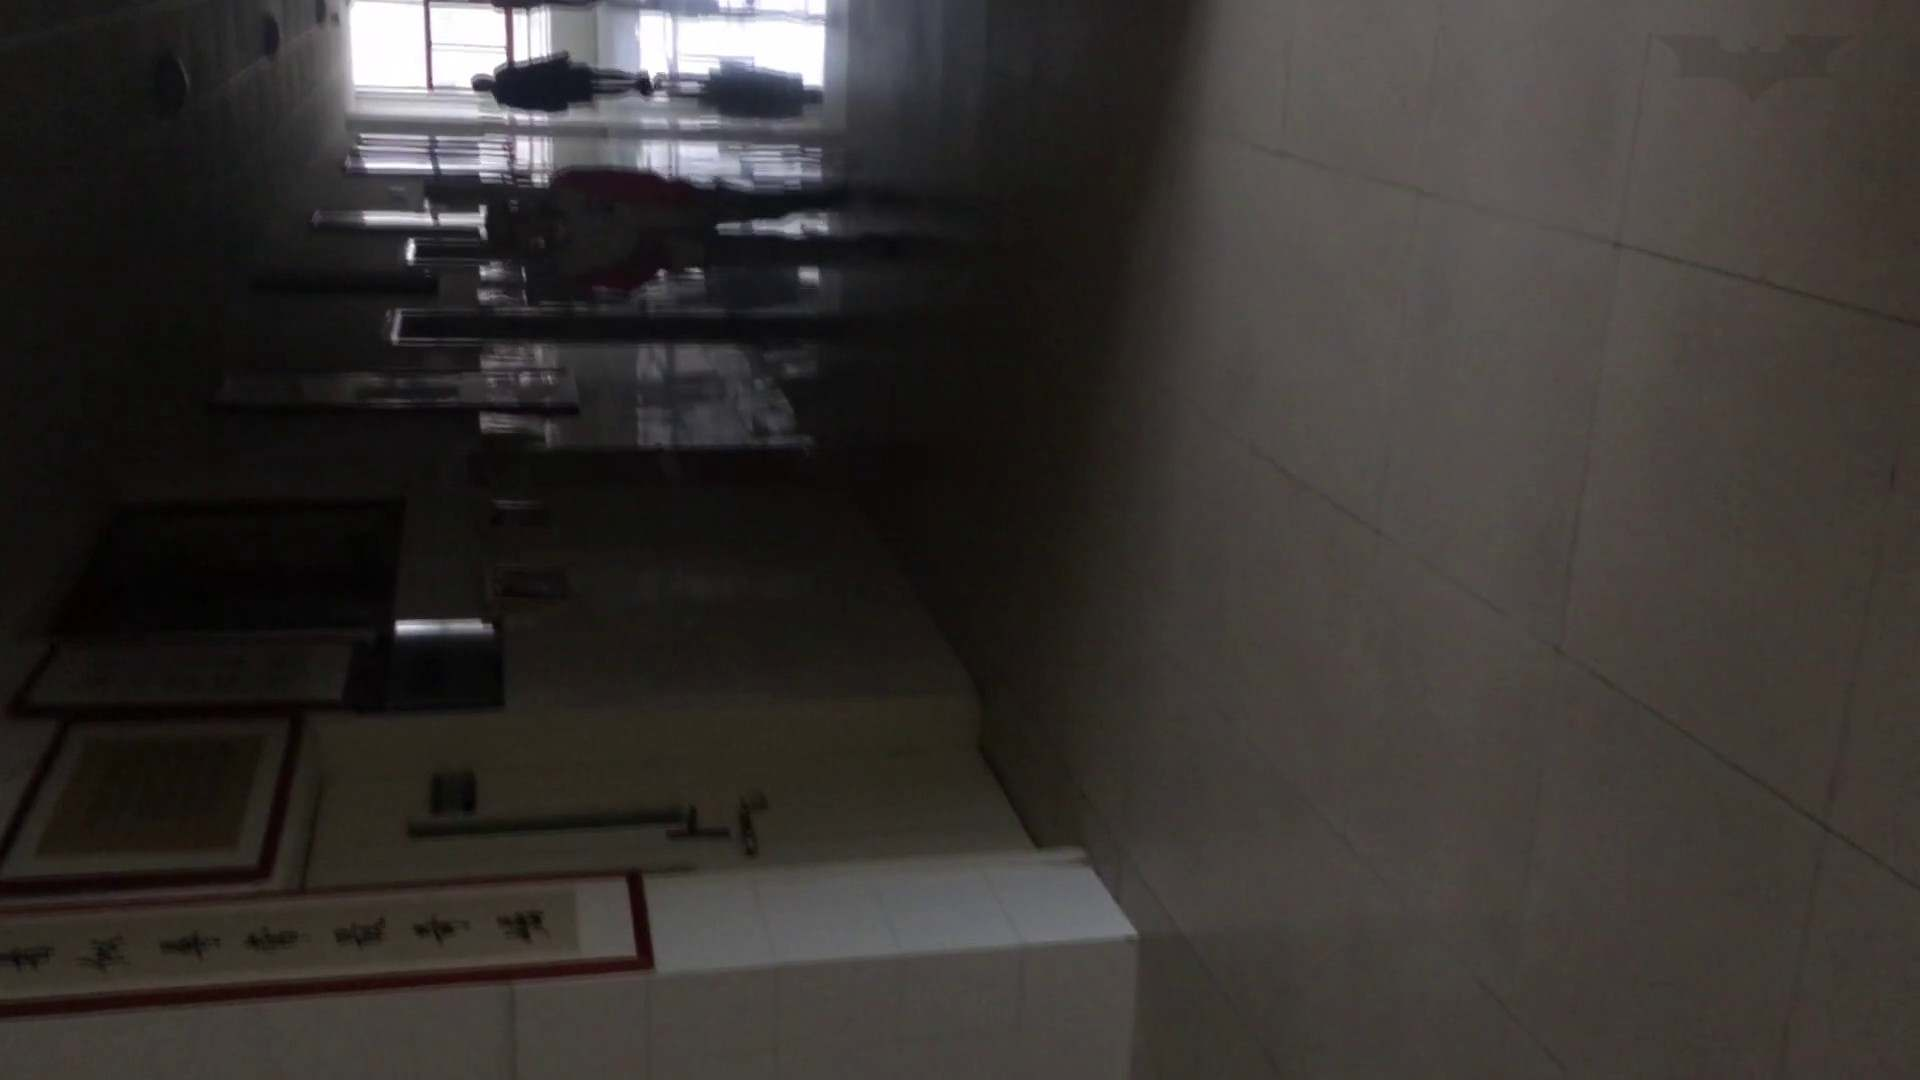 芸術大学ガチ潜入盗撮 JD盗撮 美女の洗面所の秘密 Vol.80 盛合せ  79PIX 65